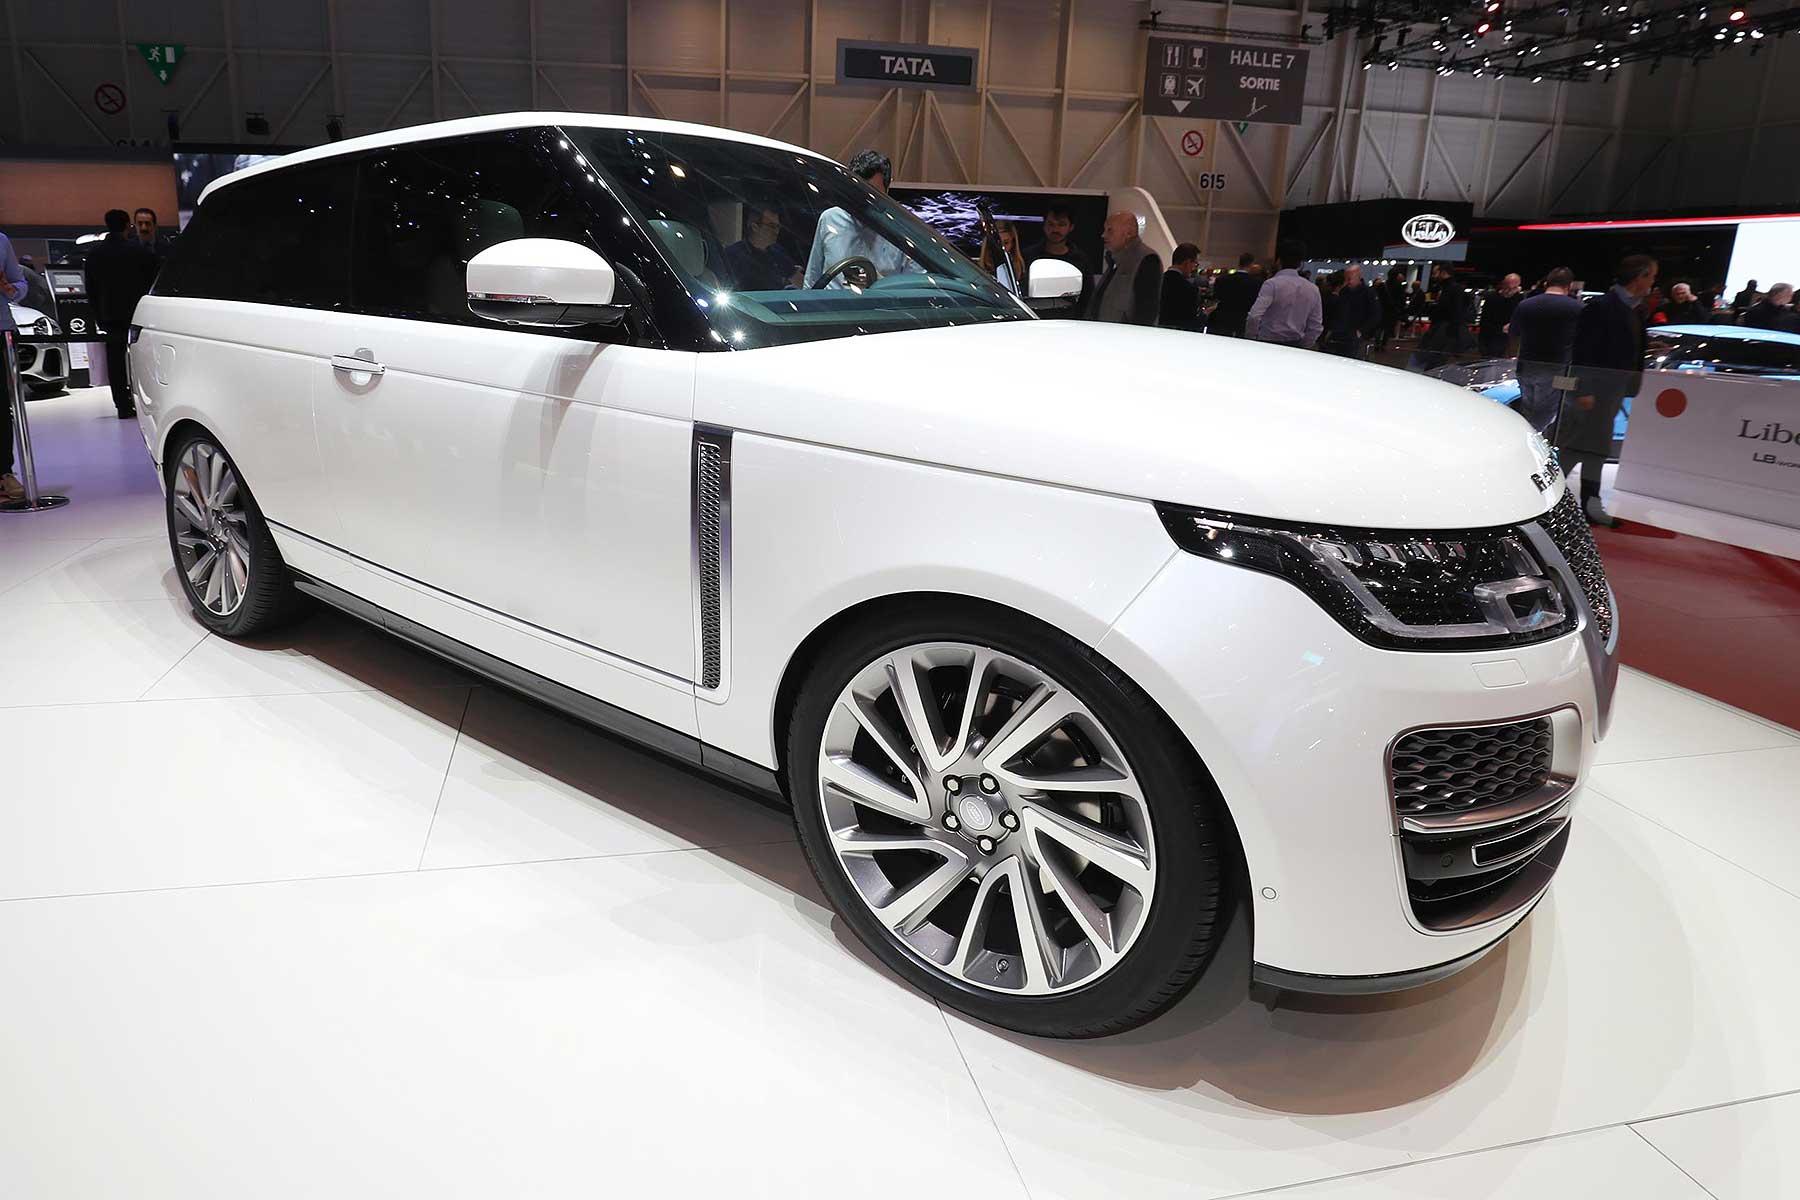 range rover sv coupe motoring research. Black Bedroom Furniture Sets. Home Design Ideas